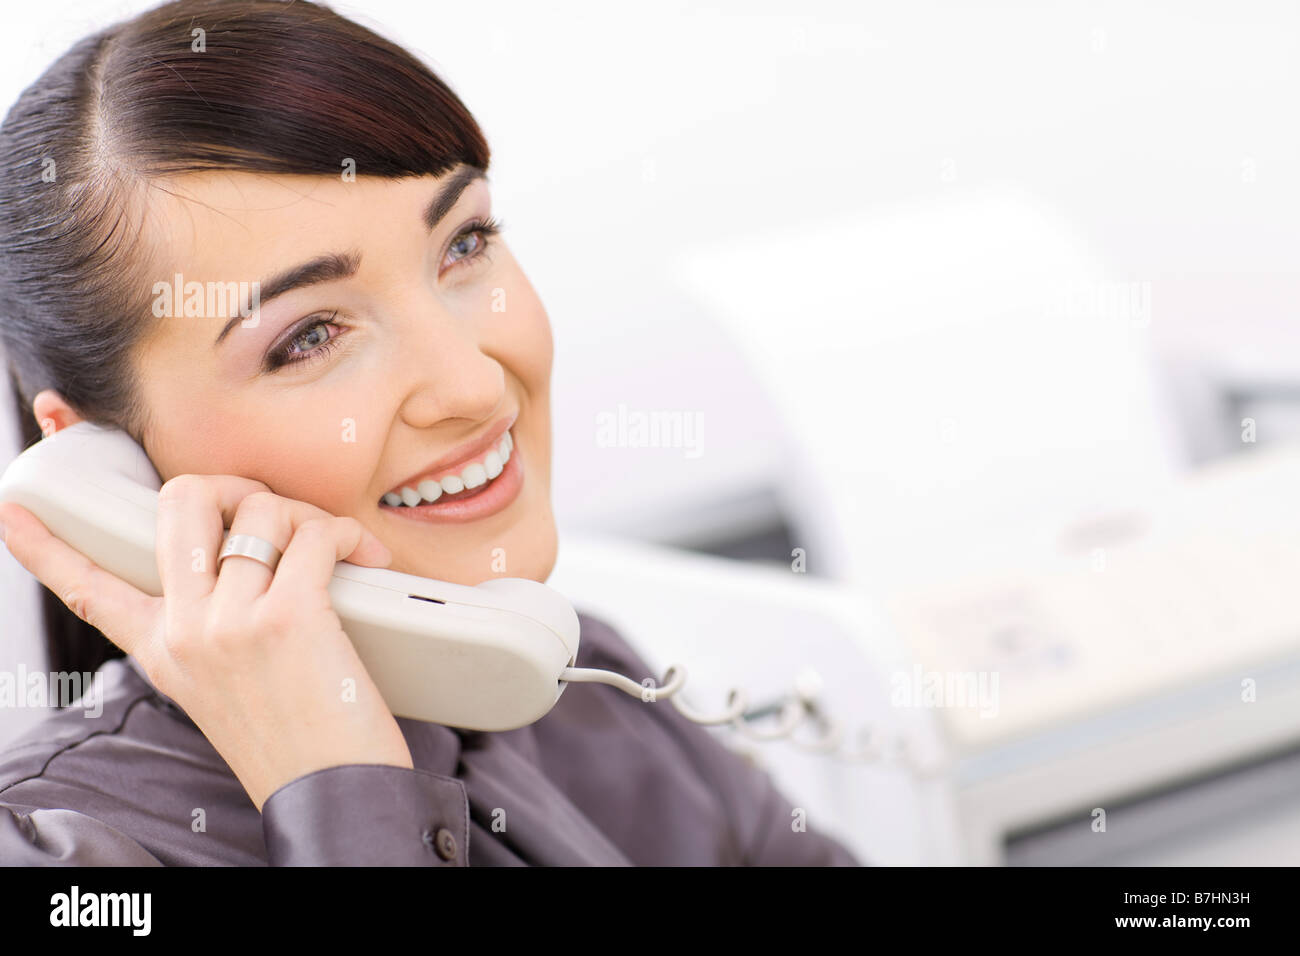 Happy Businesswoman Talking On Landline Phone In A Bright